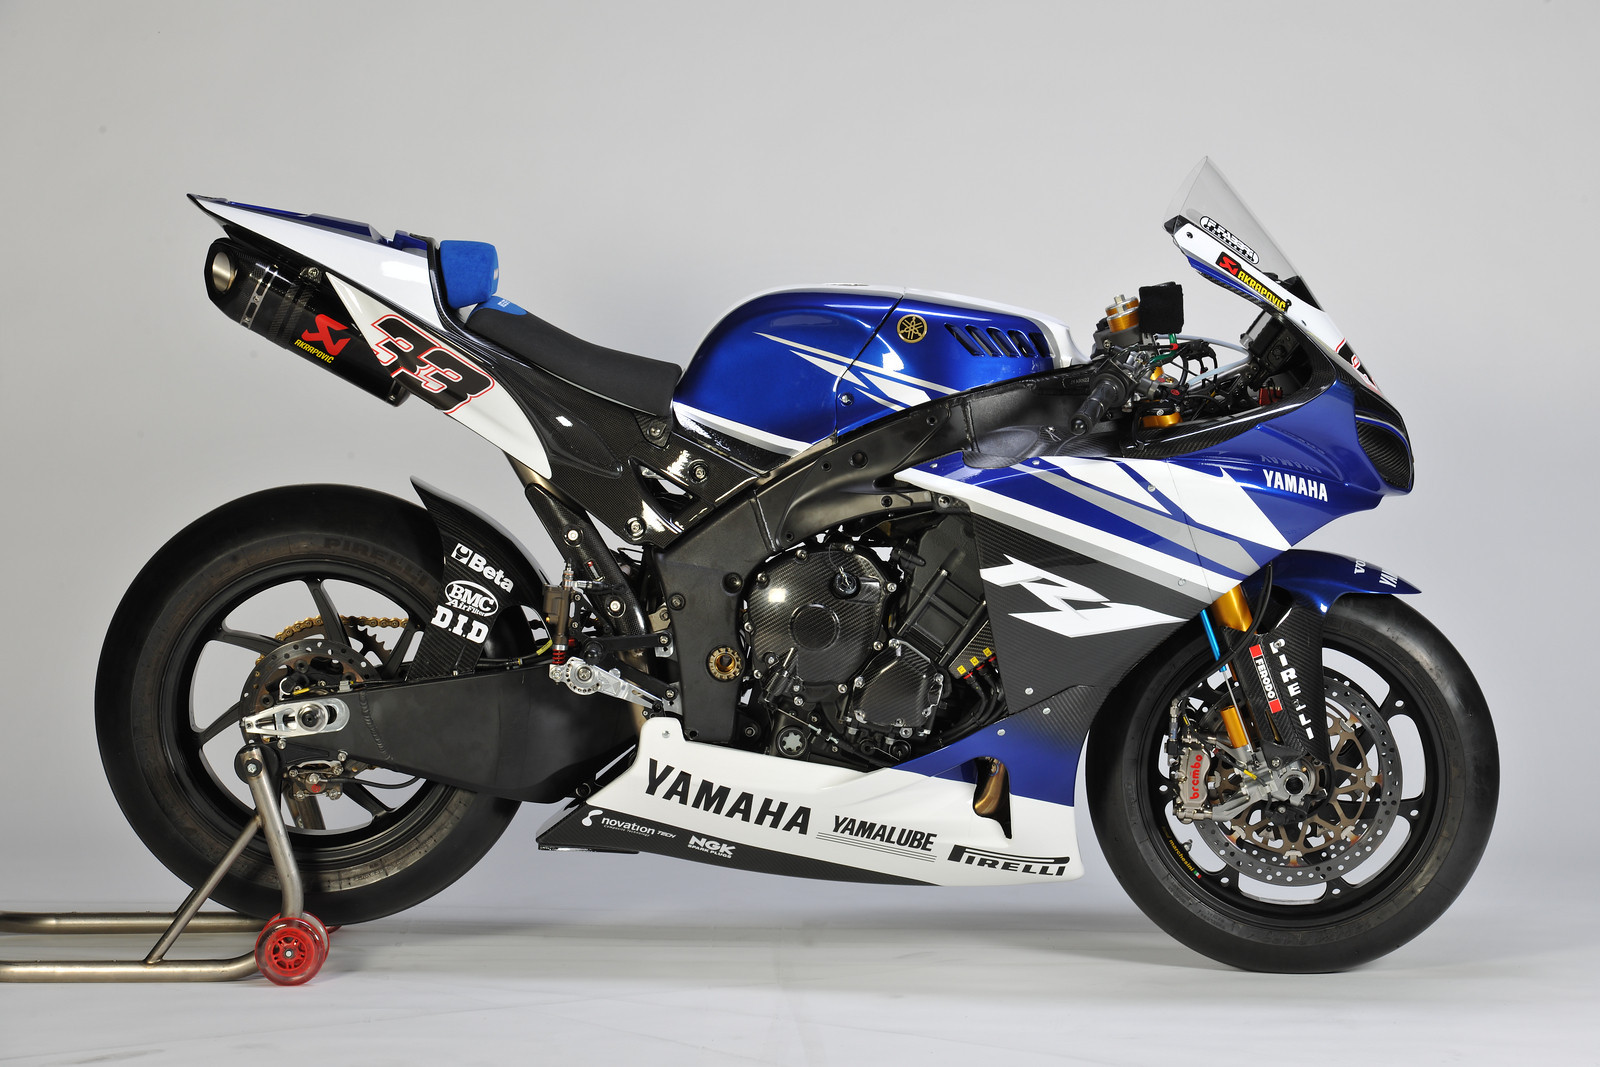 superbike - photo #10